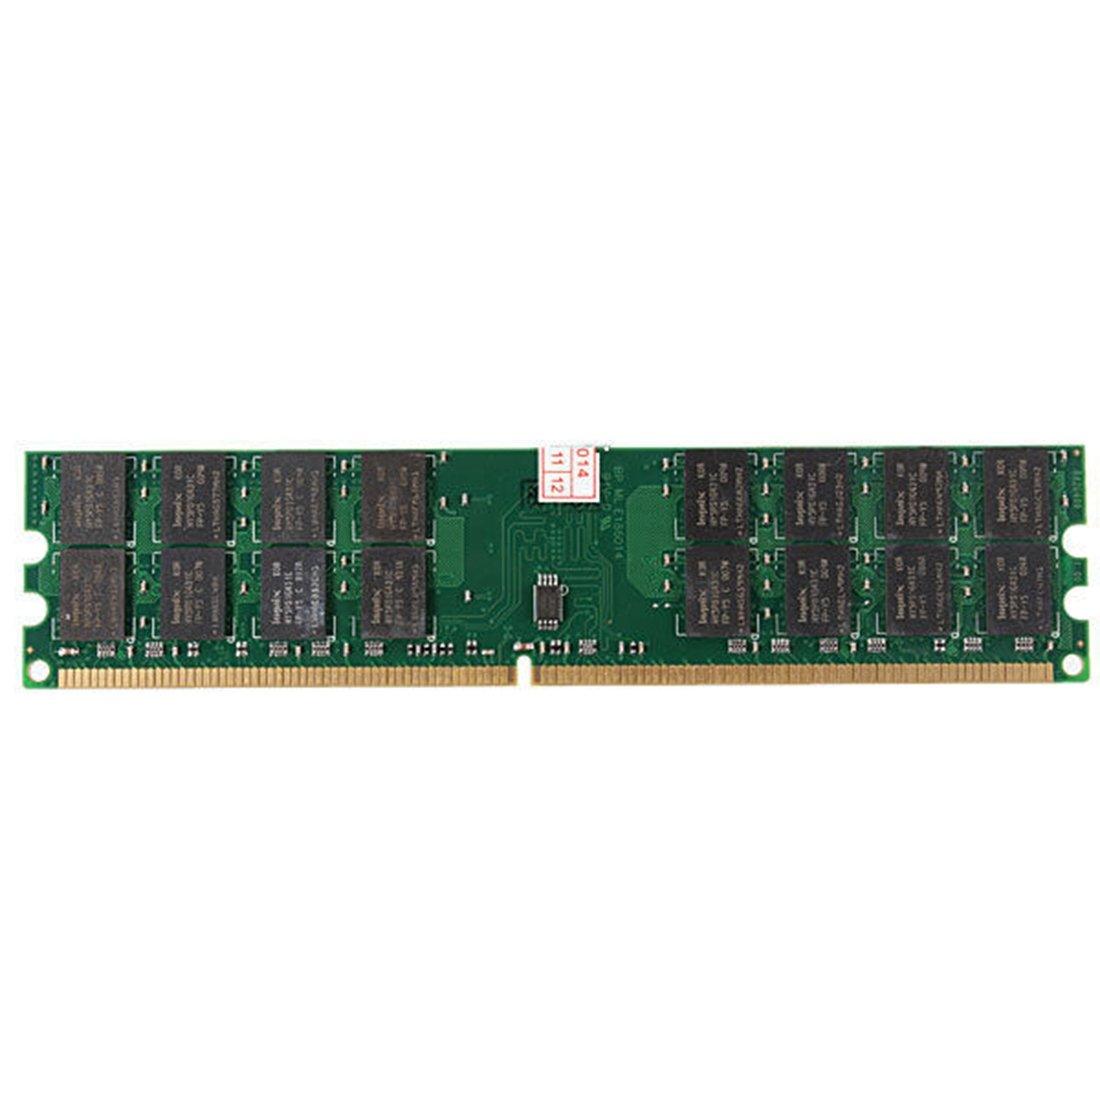 4GB Memory RAM - SODIAL(R)New 4GB Memory RAM DDR2 800MHZ PC2-6400 240 Pin Desktop DIMM AMD Motherboard